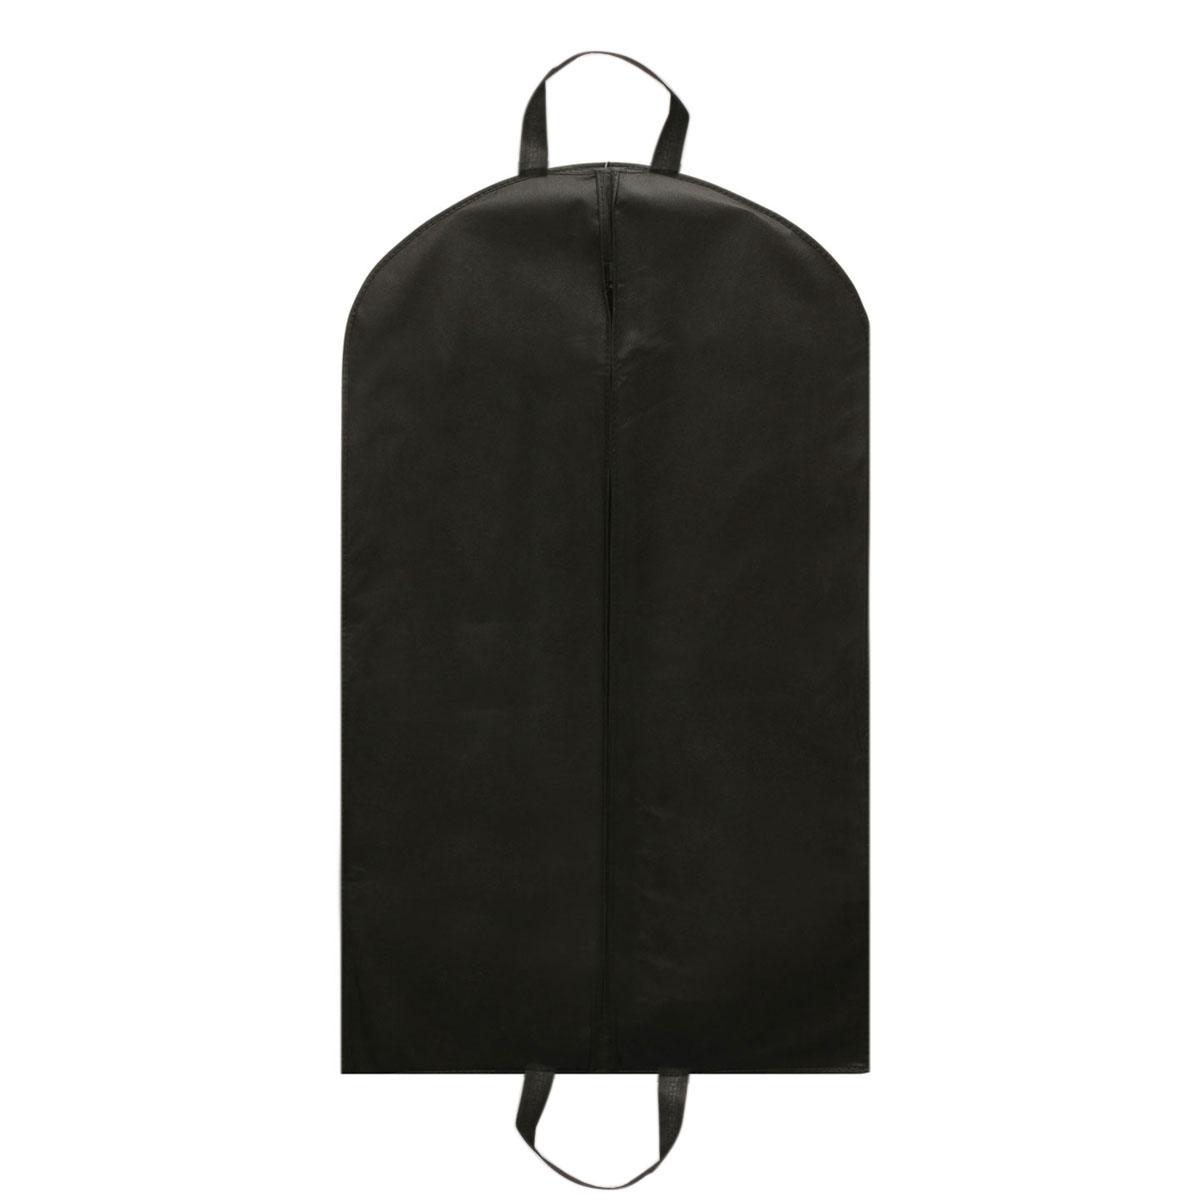 Black Suit Zip Bag Hanger Storage Home Dress Coat Garment Storage Travel Carrier Bag Cover Hanging Dustproof Protector(China (Mainland))